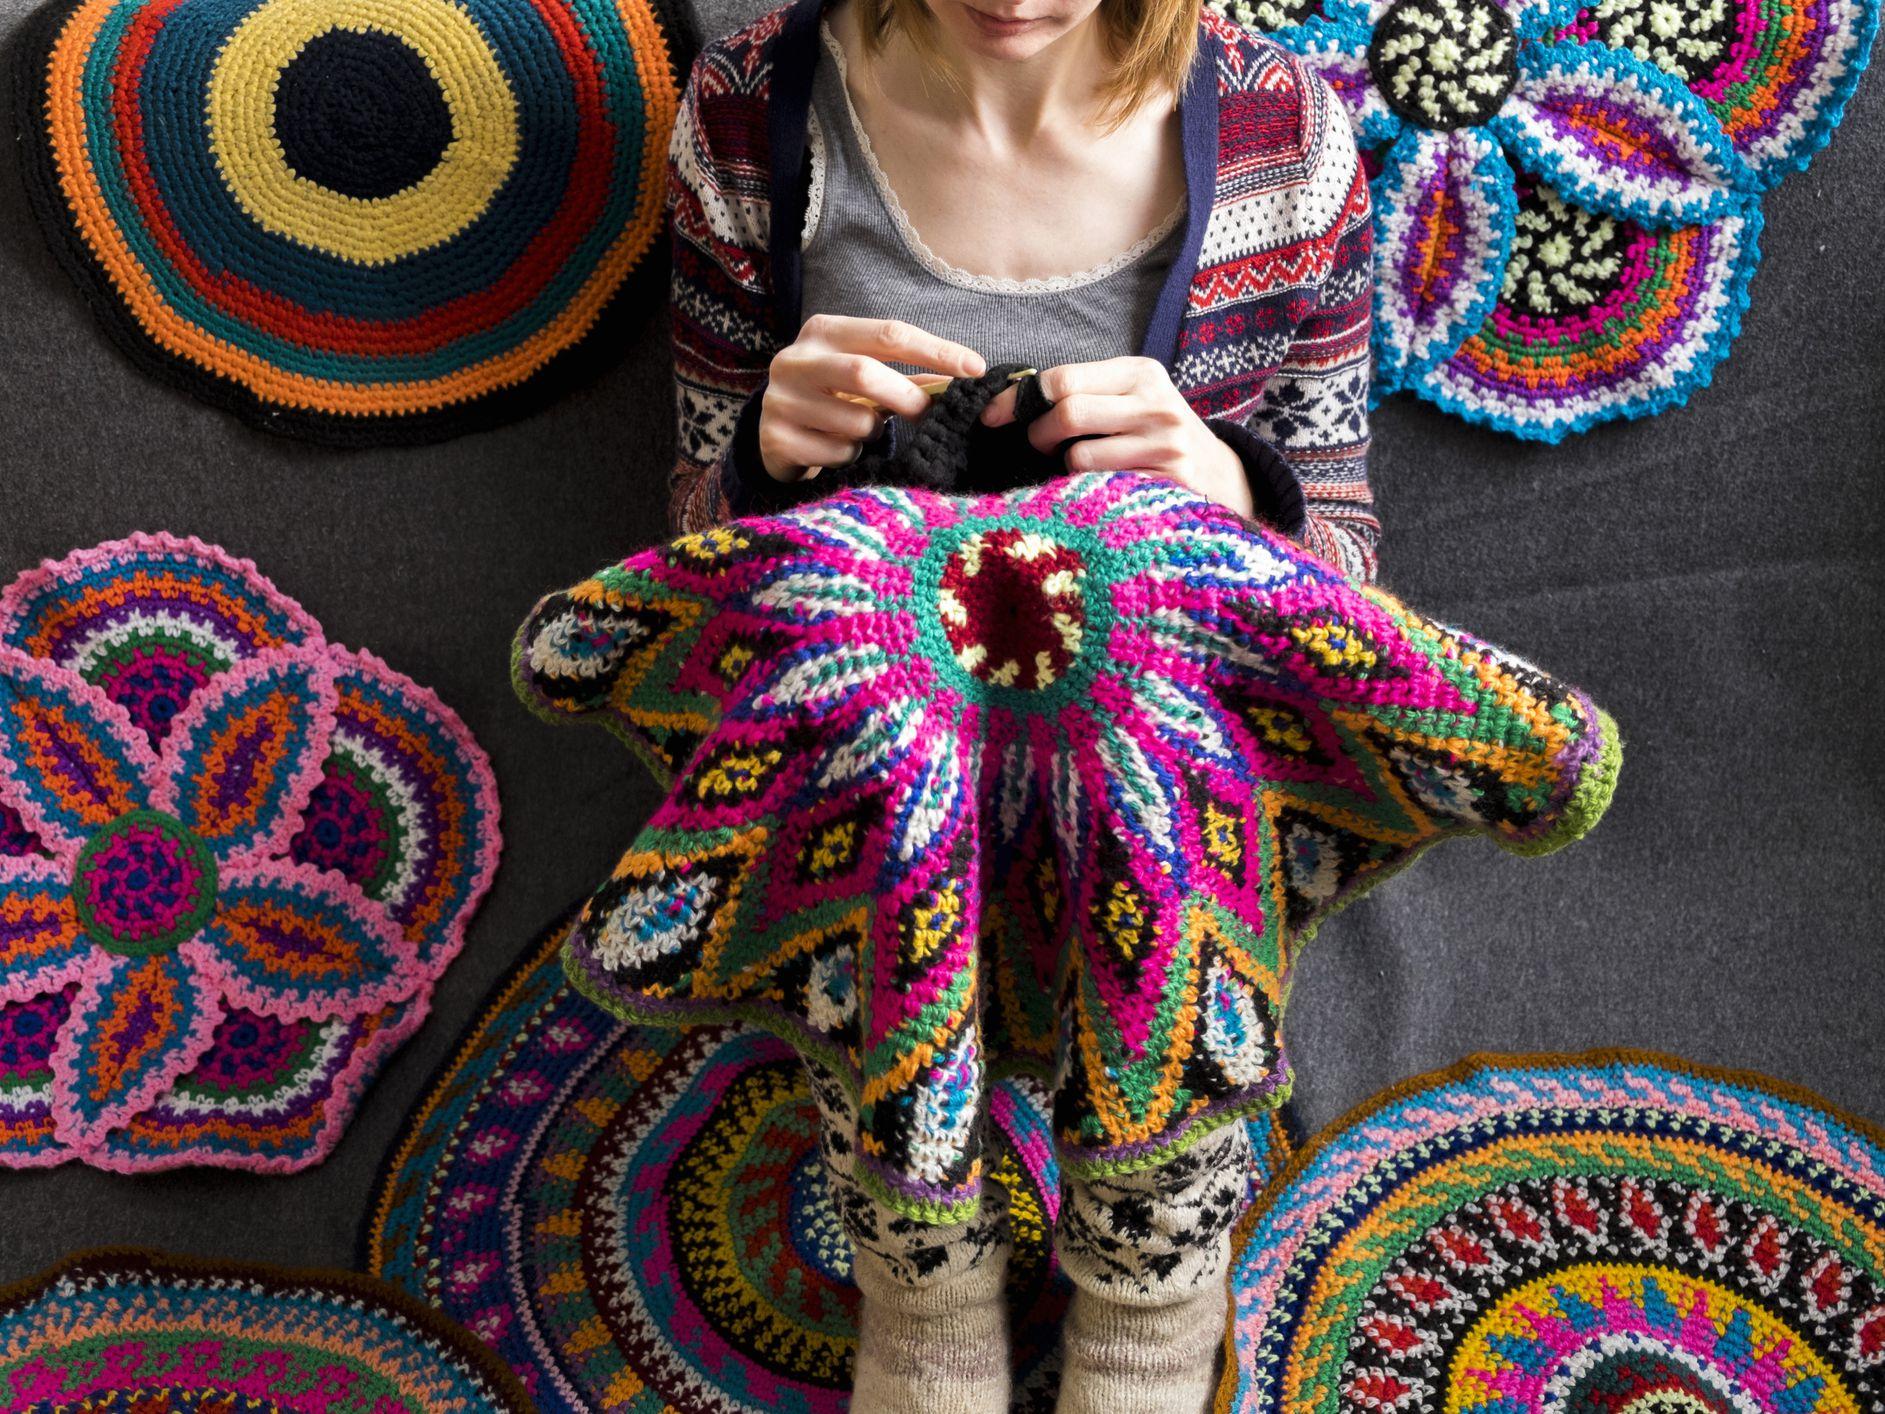 Crochet Basic Stitches #3 - Half Double Crochet (hdc) - YouTube | 1414x1885